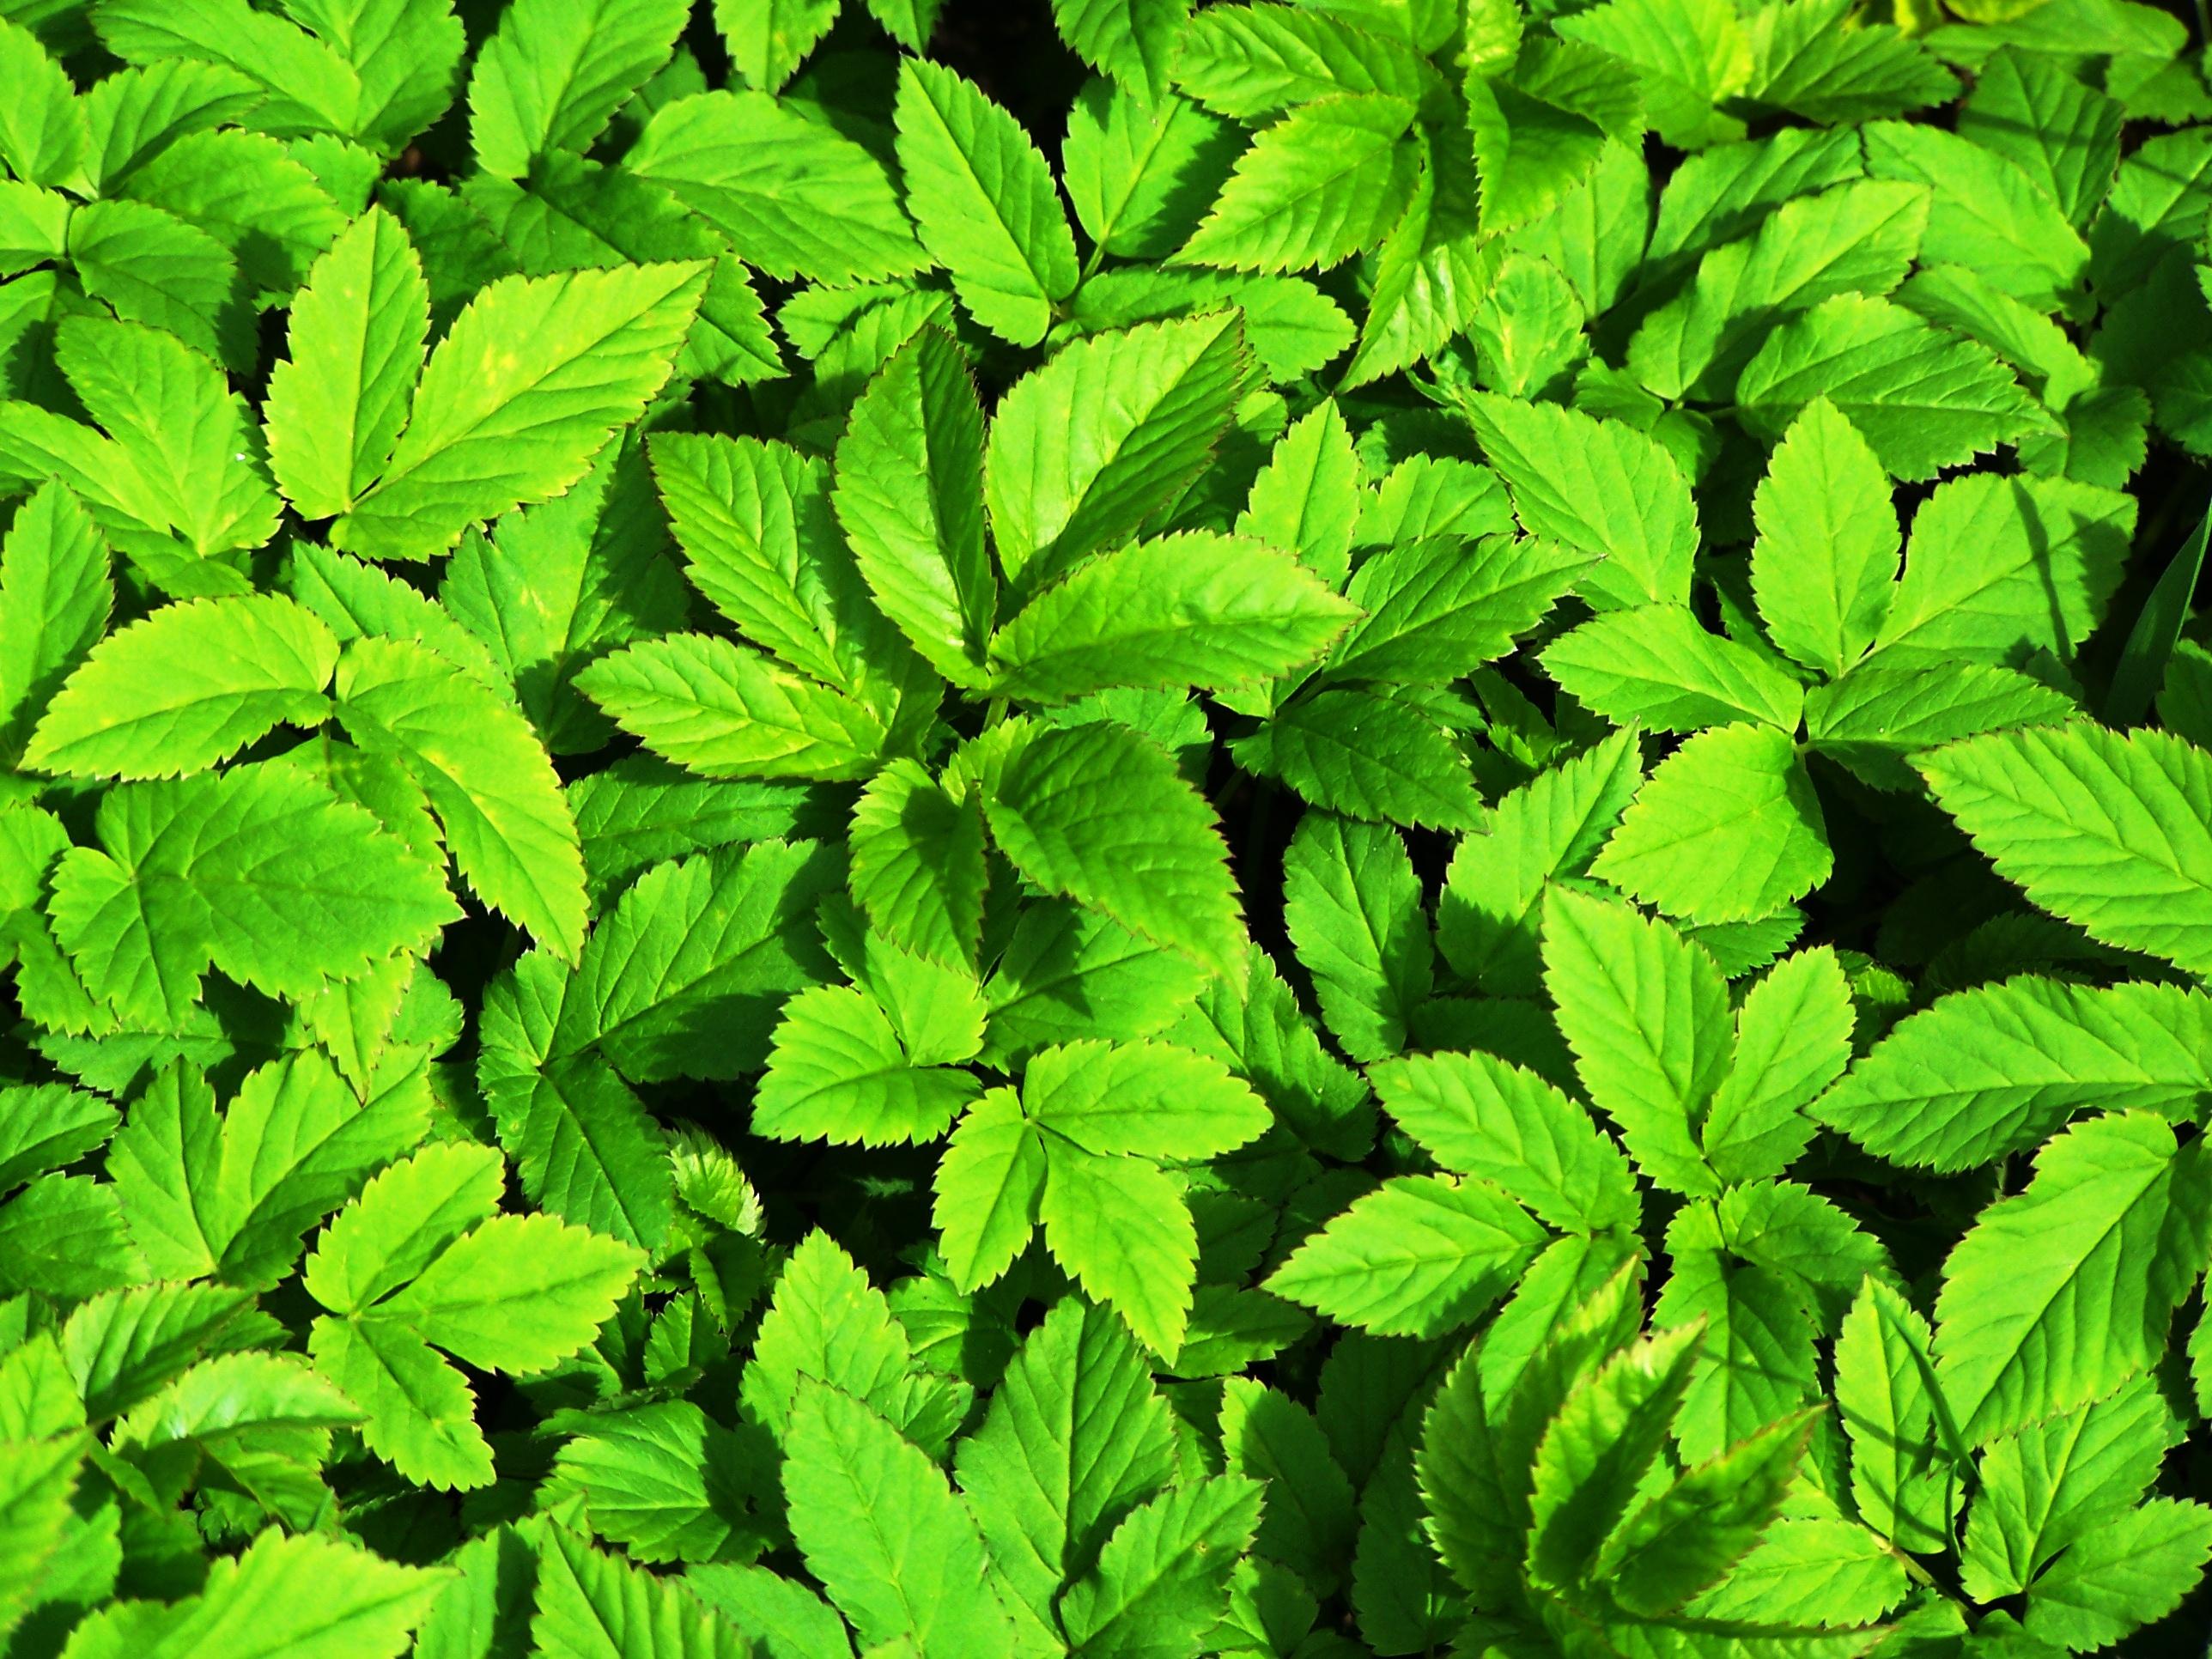 Green plants photo